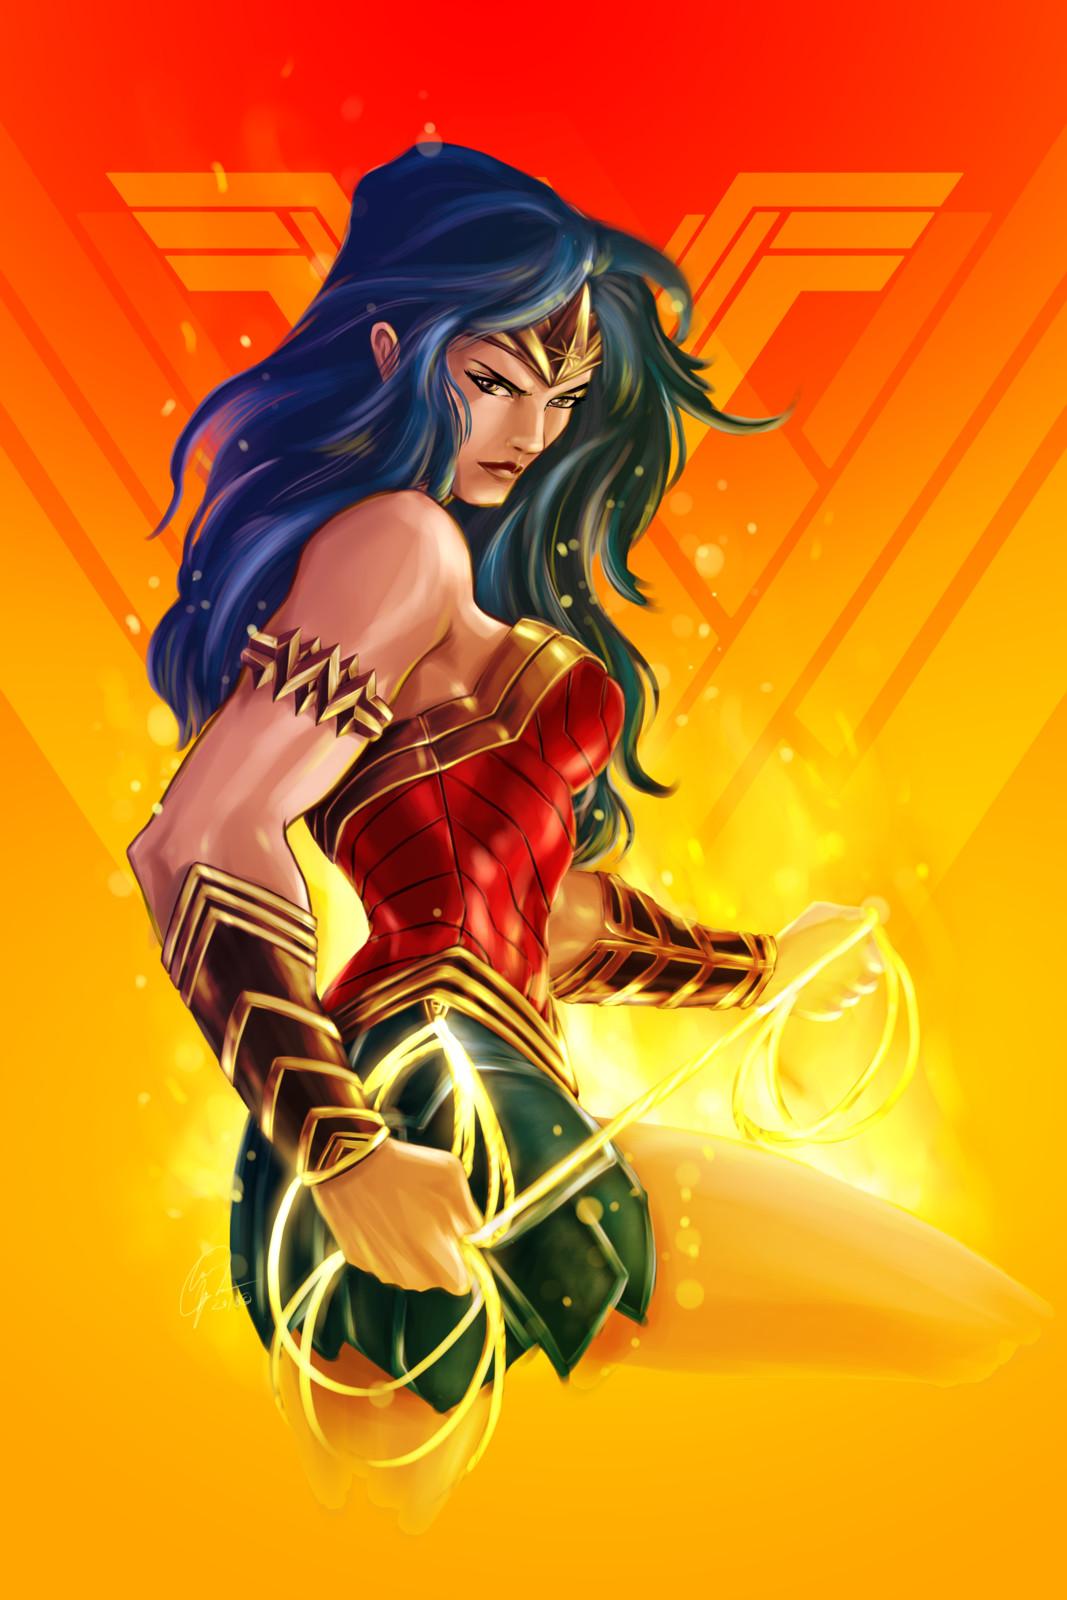 Warrior Princess / Wonder Woman